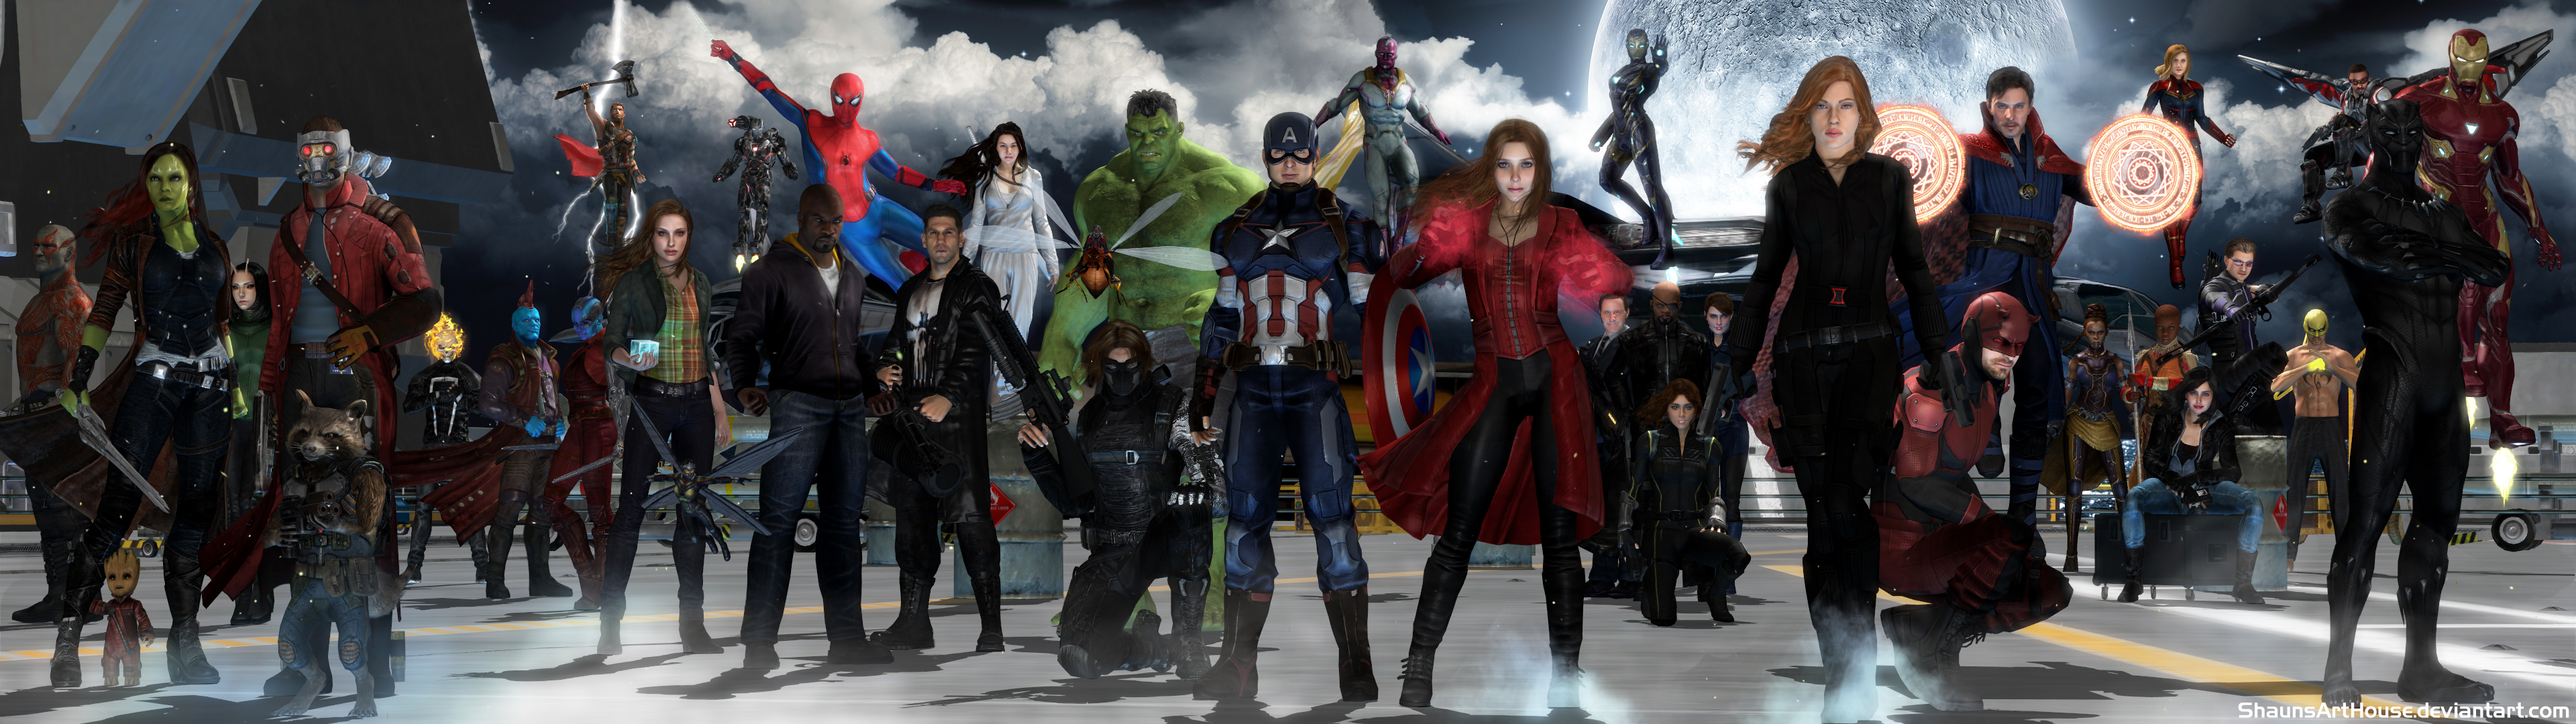 Avengers Mcu Dual Screen Wallpaper By Shaunsarthouse On Deviantart